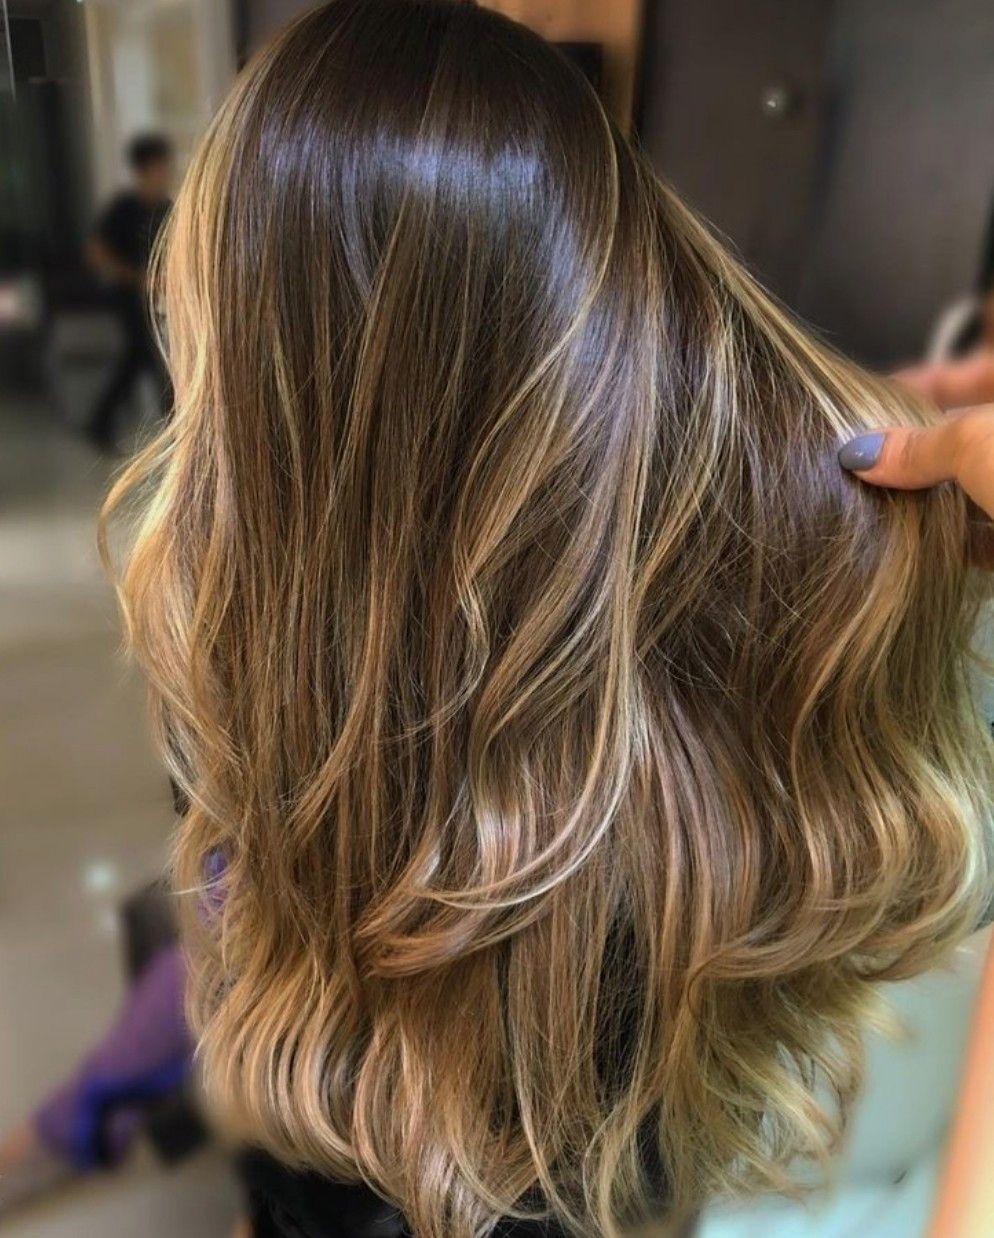 Hair Inspiration 2019-04-23 23:32:37